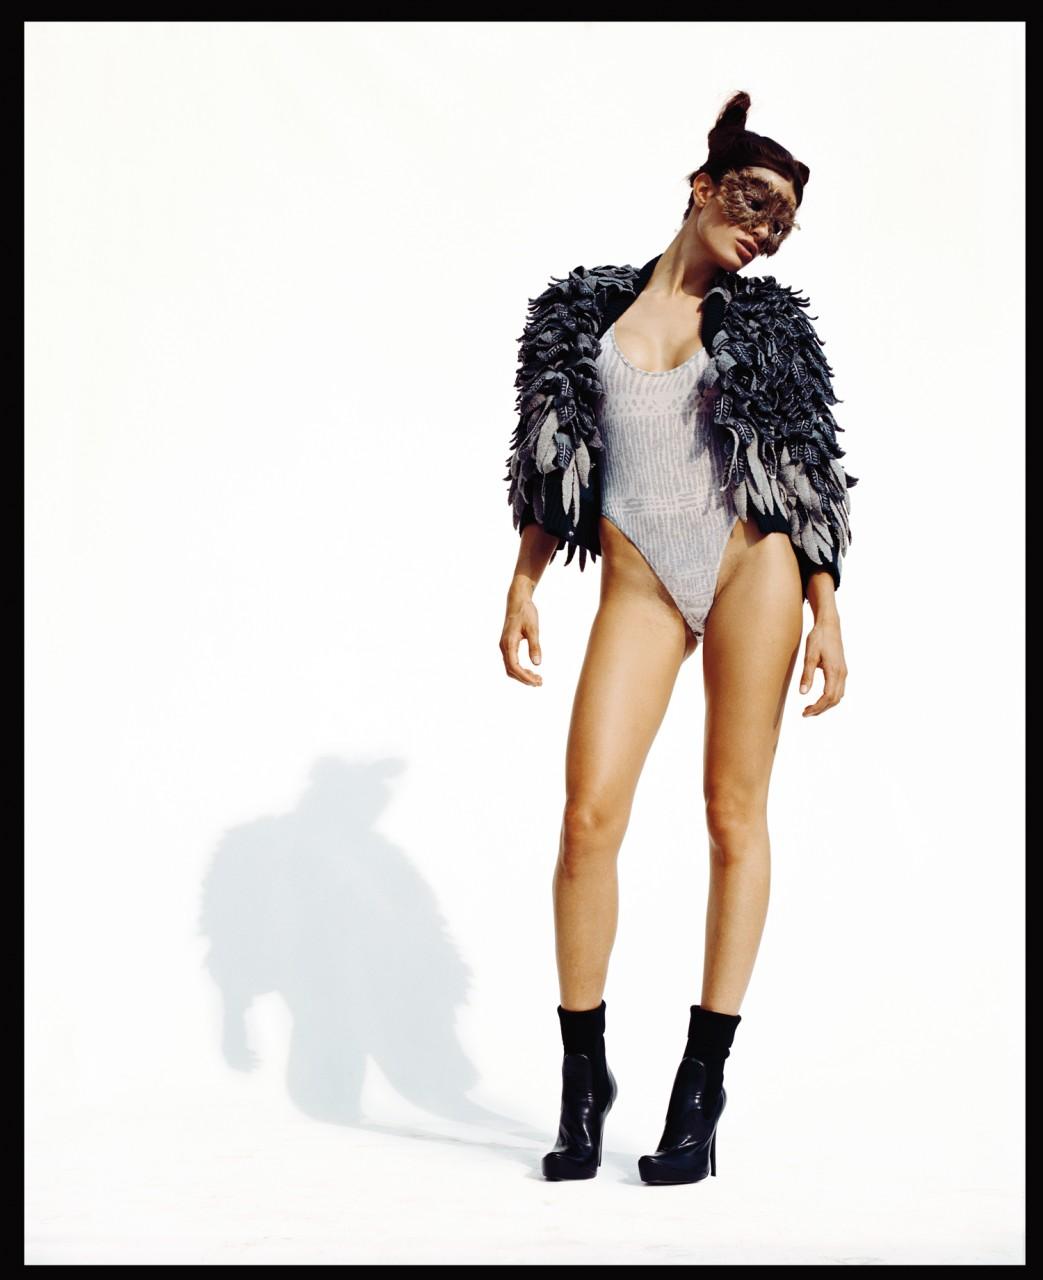 Изабели Фонтана  в фотосессии Ричарда Буша  для журнала Purple осень-зима 2007